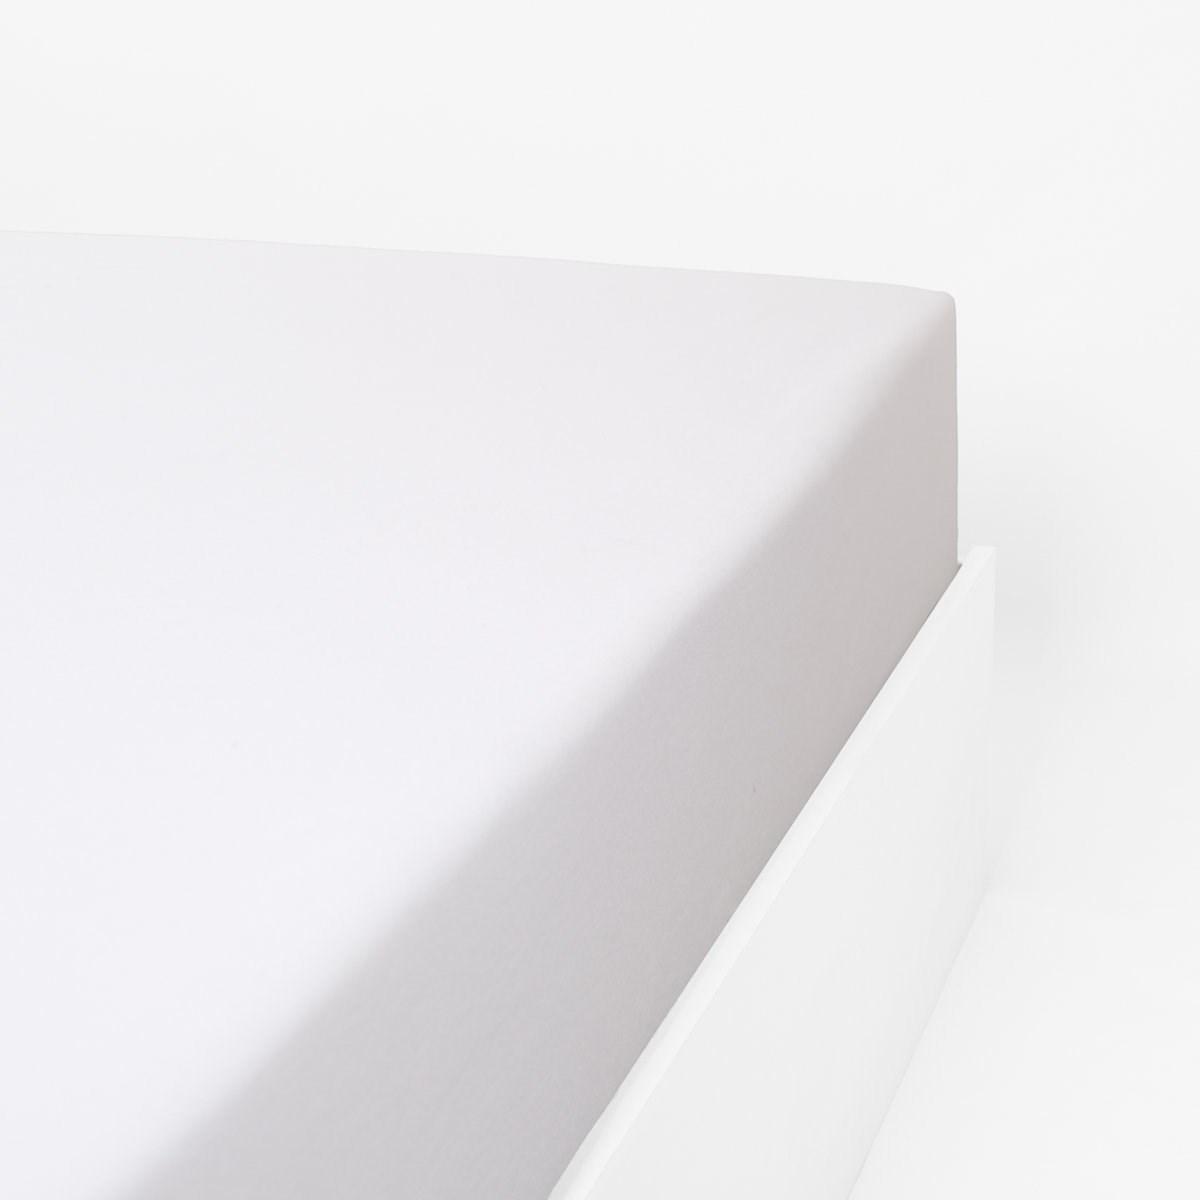 Drap housse flanelle en Molleton Blanc 70x190 cm